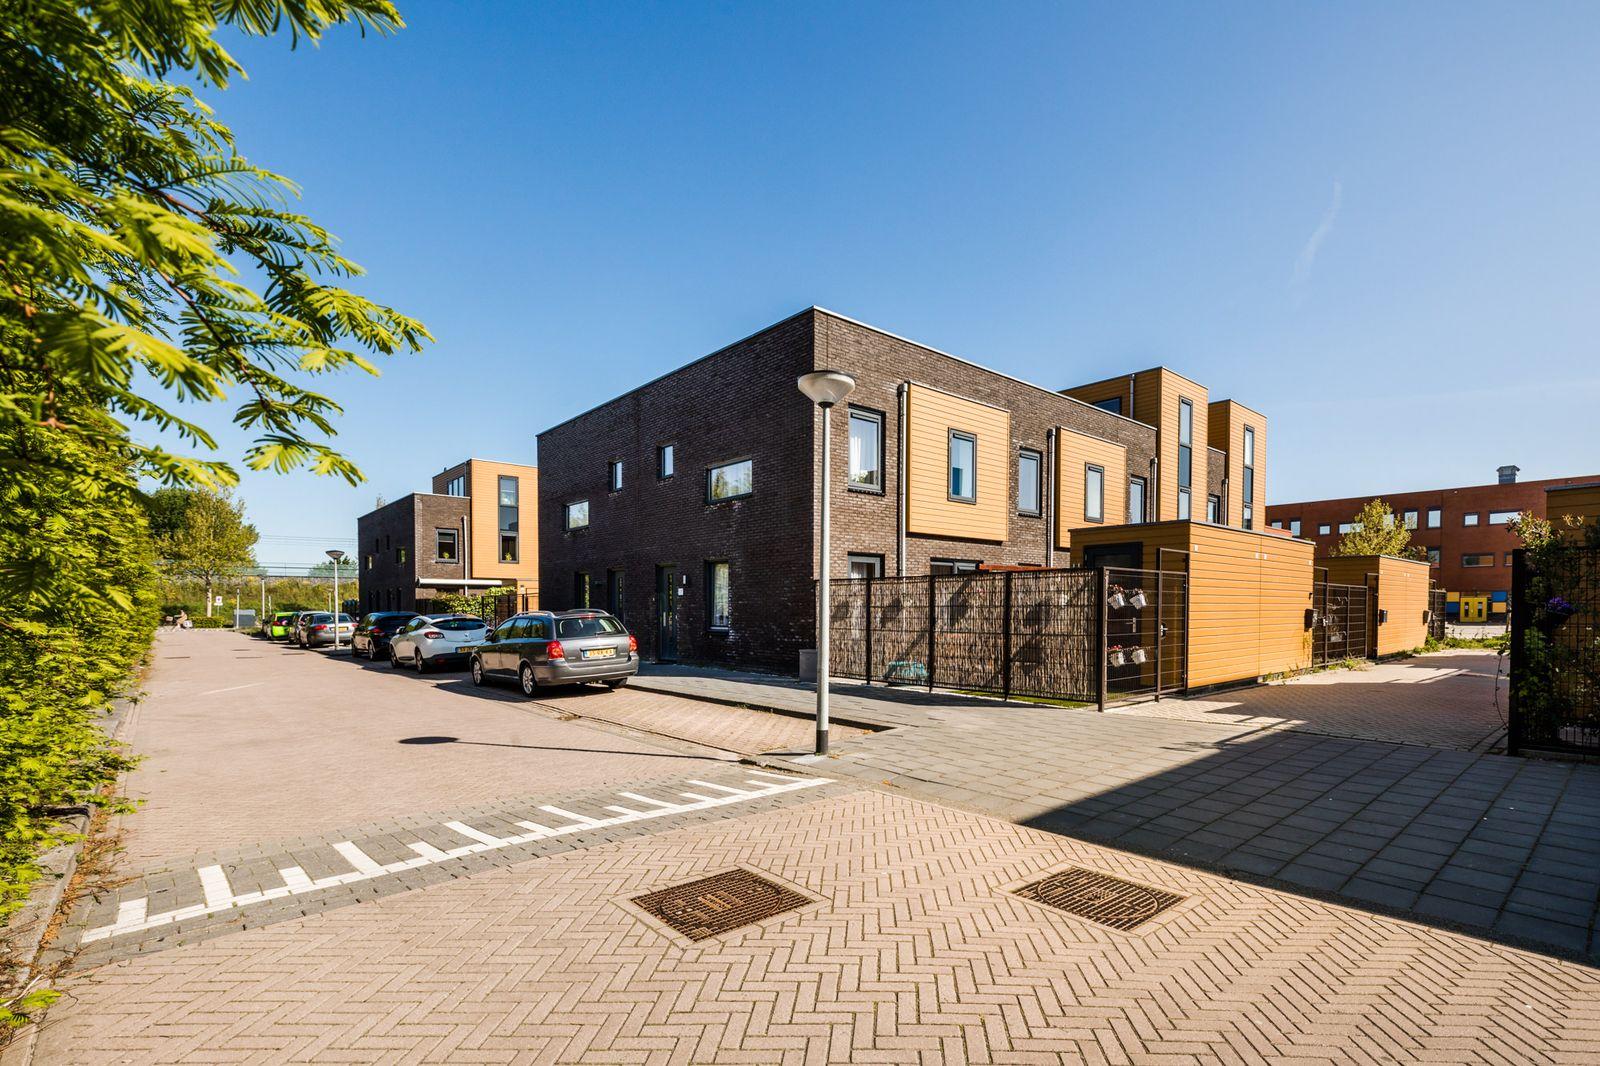 Makassarweg 22, Almere